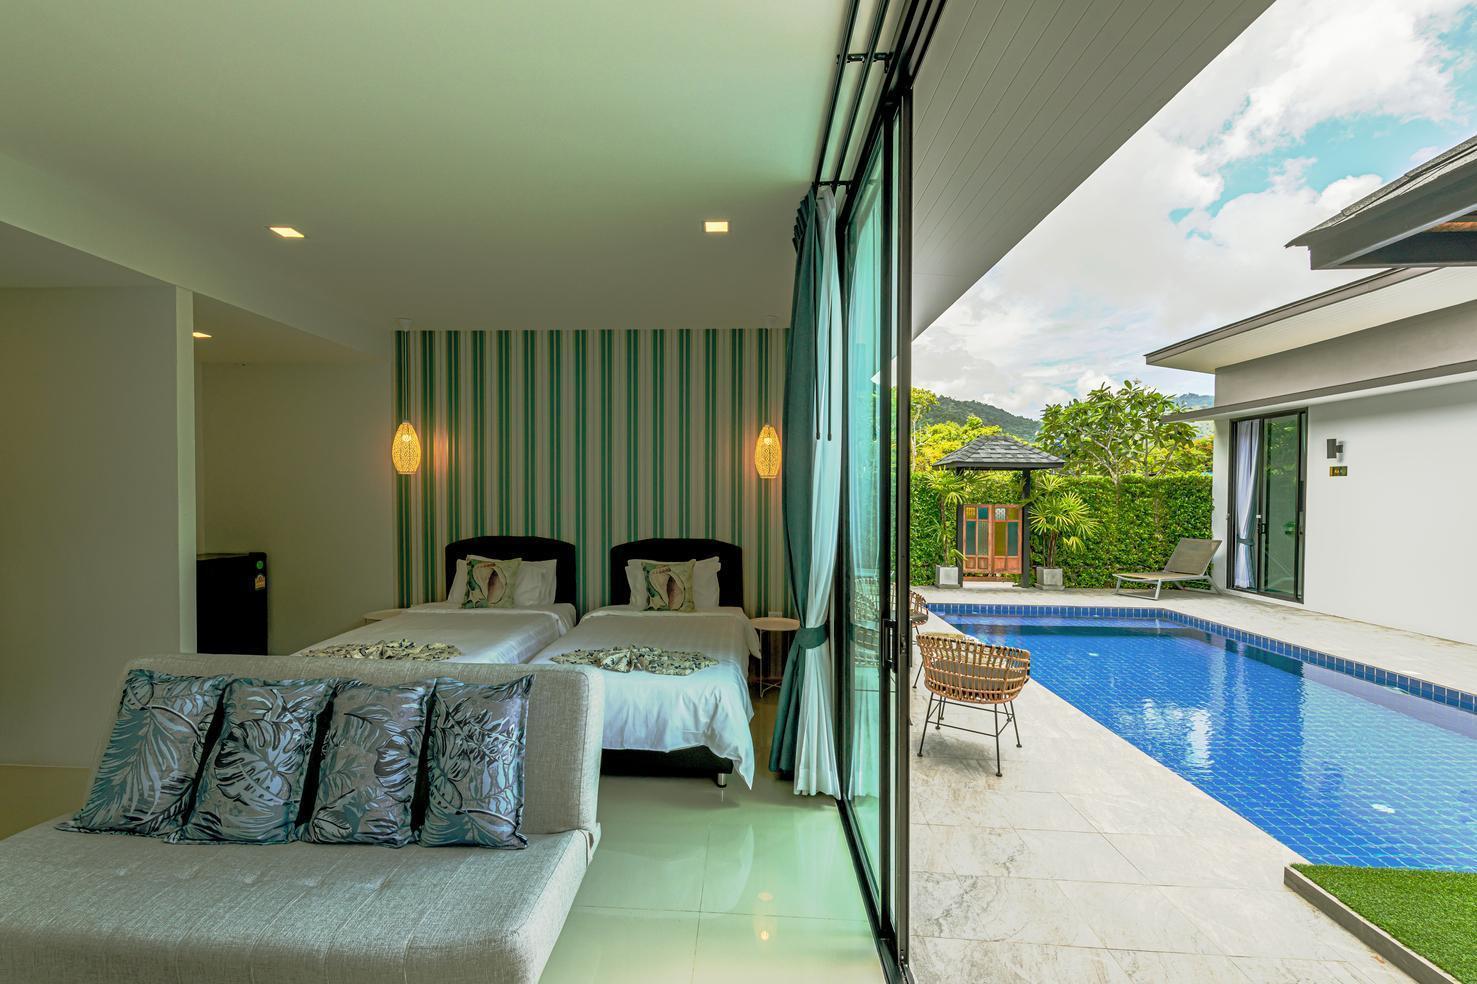 Les Palm Taraburi Pool Villa เล ปาล์ม ธาราบุรี พูล วิลลา